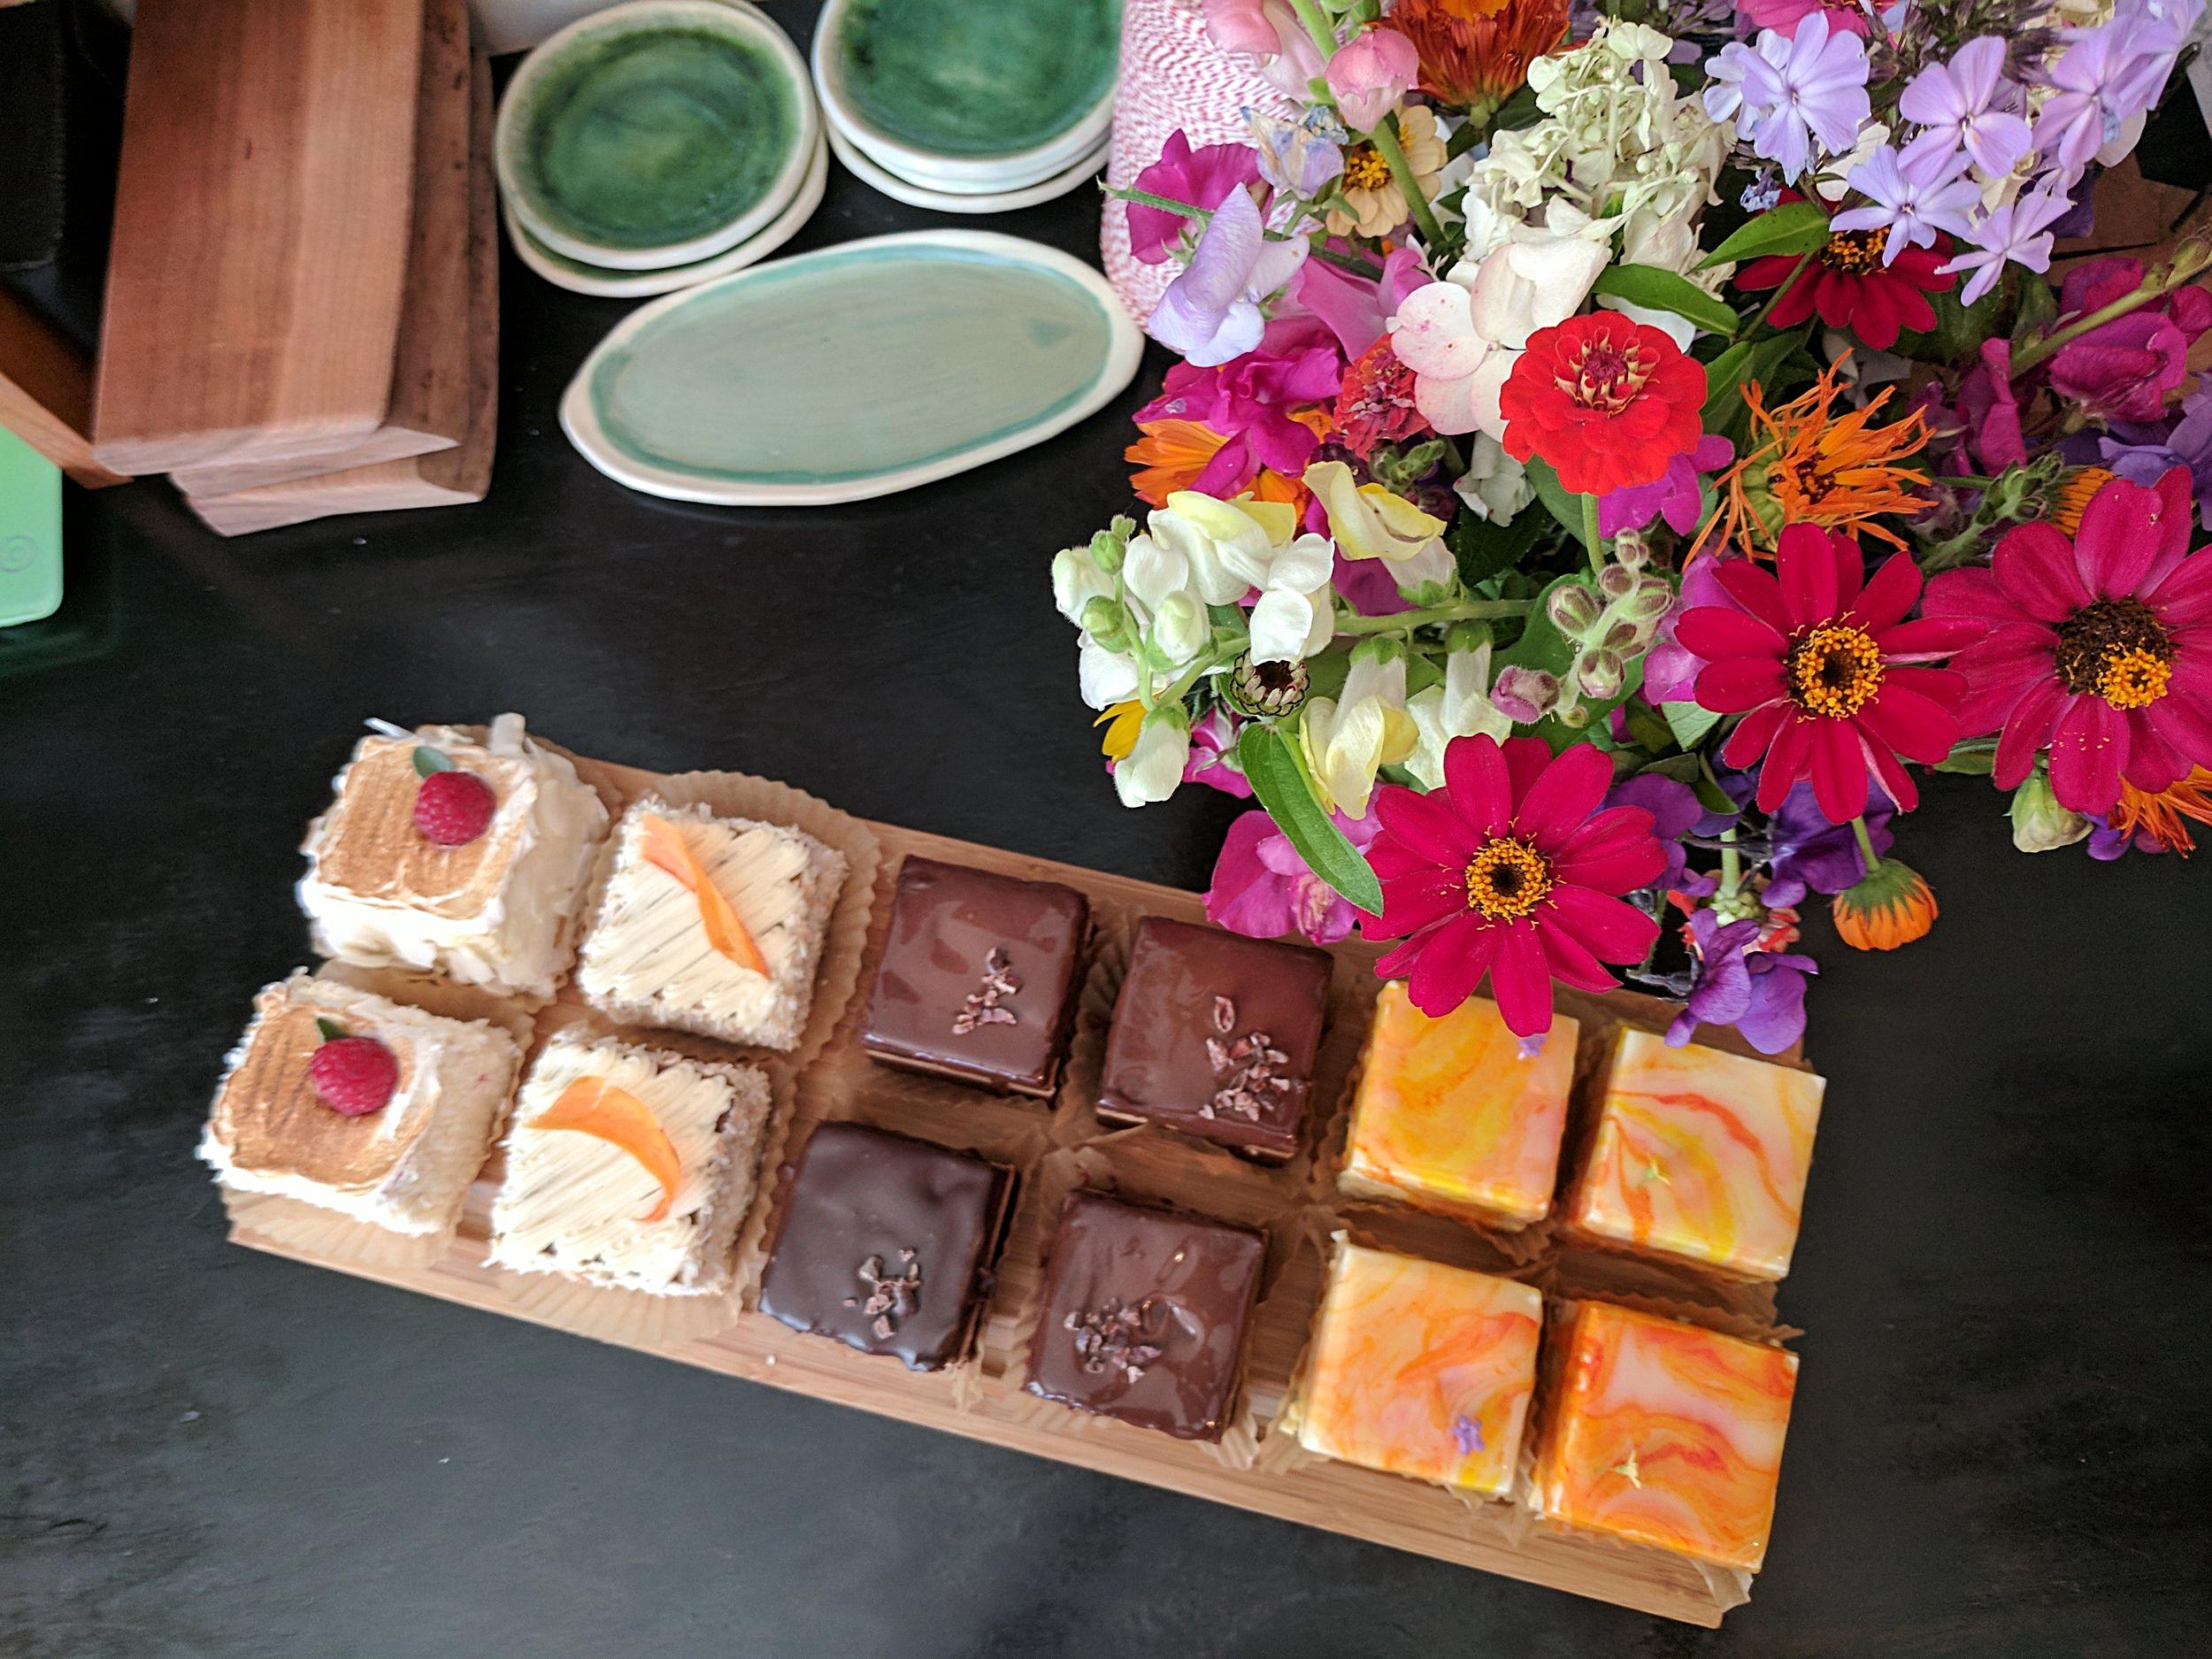 Gateaux (angel food, carrot cake, midnight/chocolate, sunrise/passionfruit)